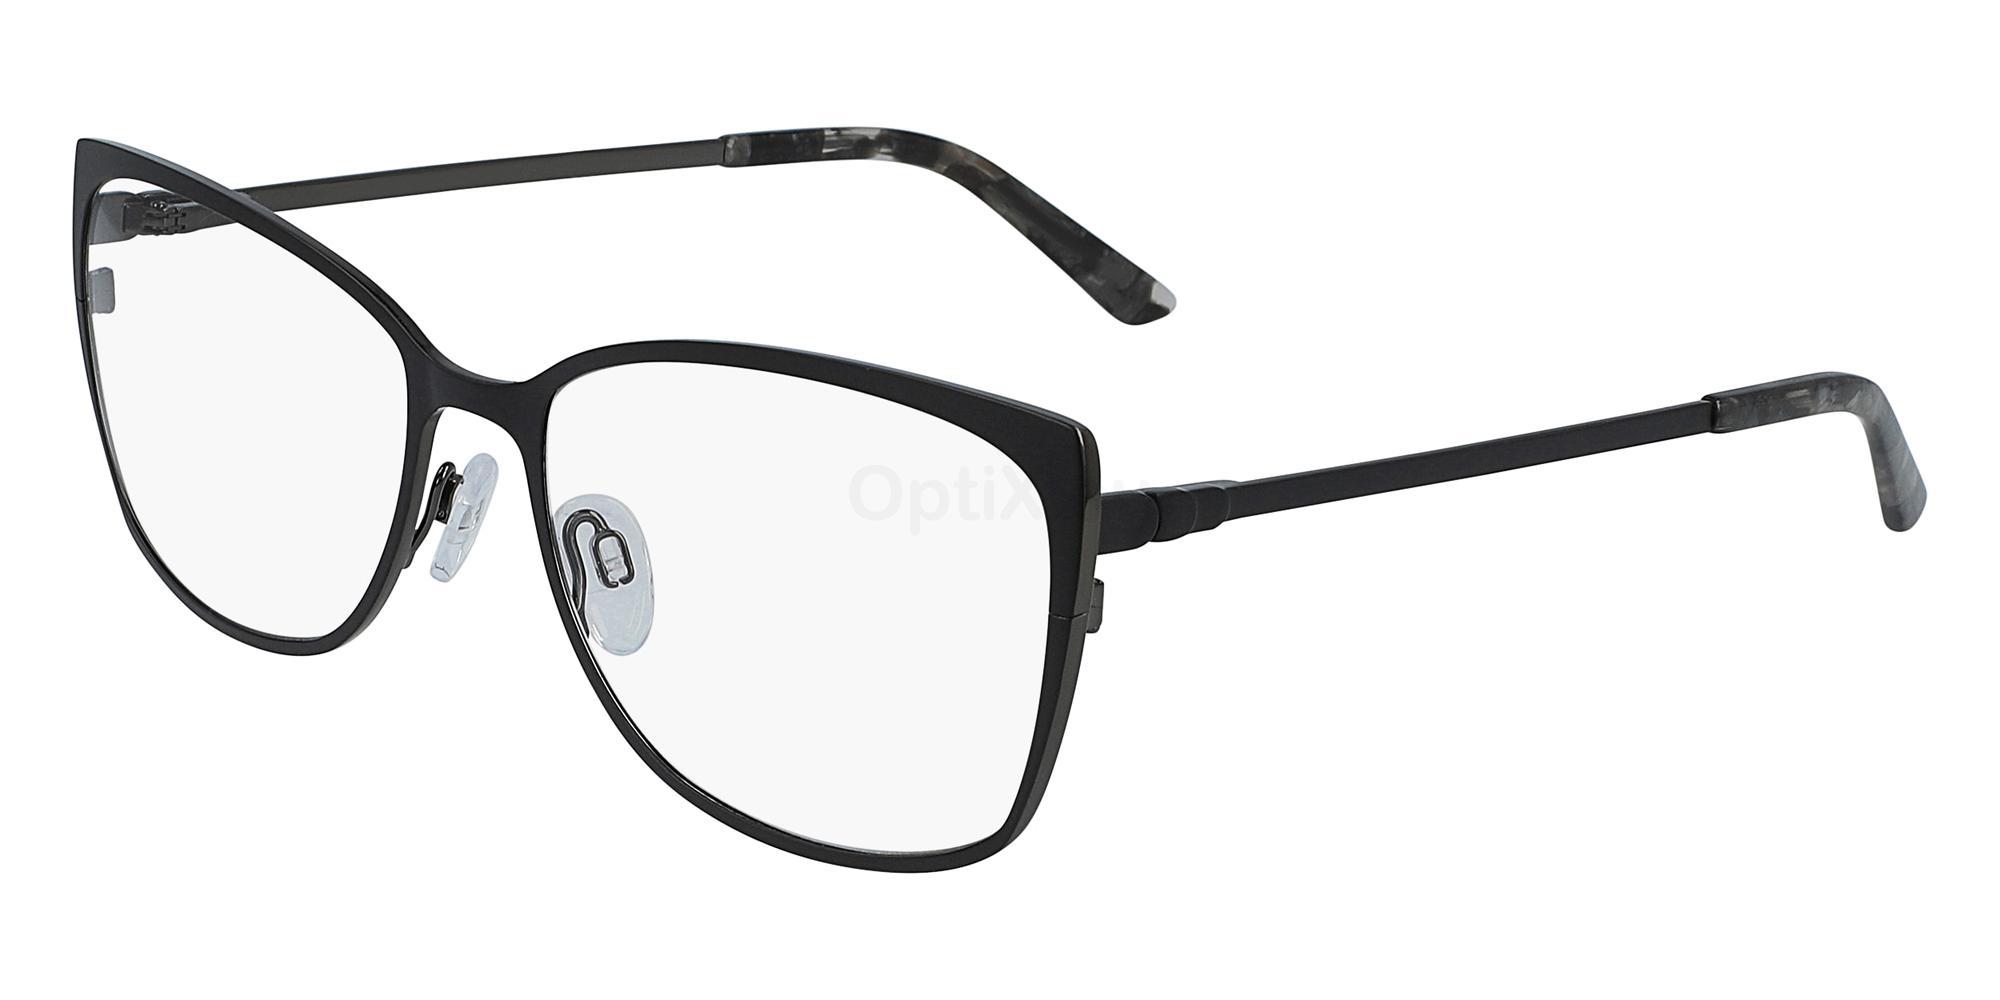 024 SK2827 KREATIV Glasses, Skaga